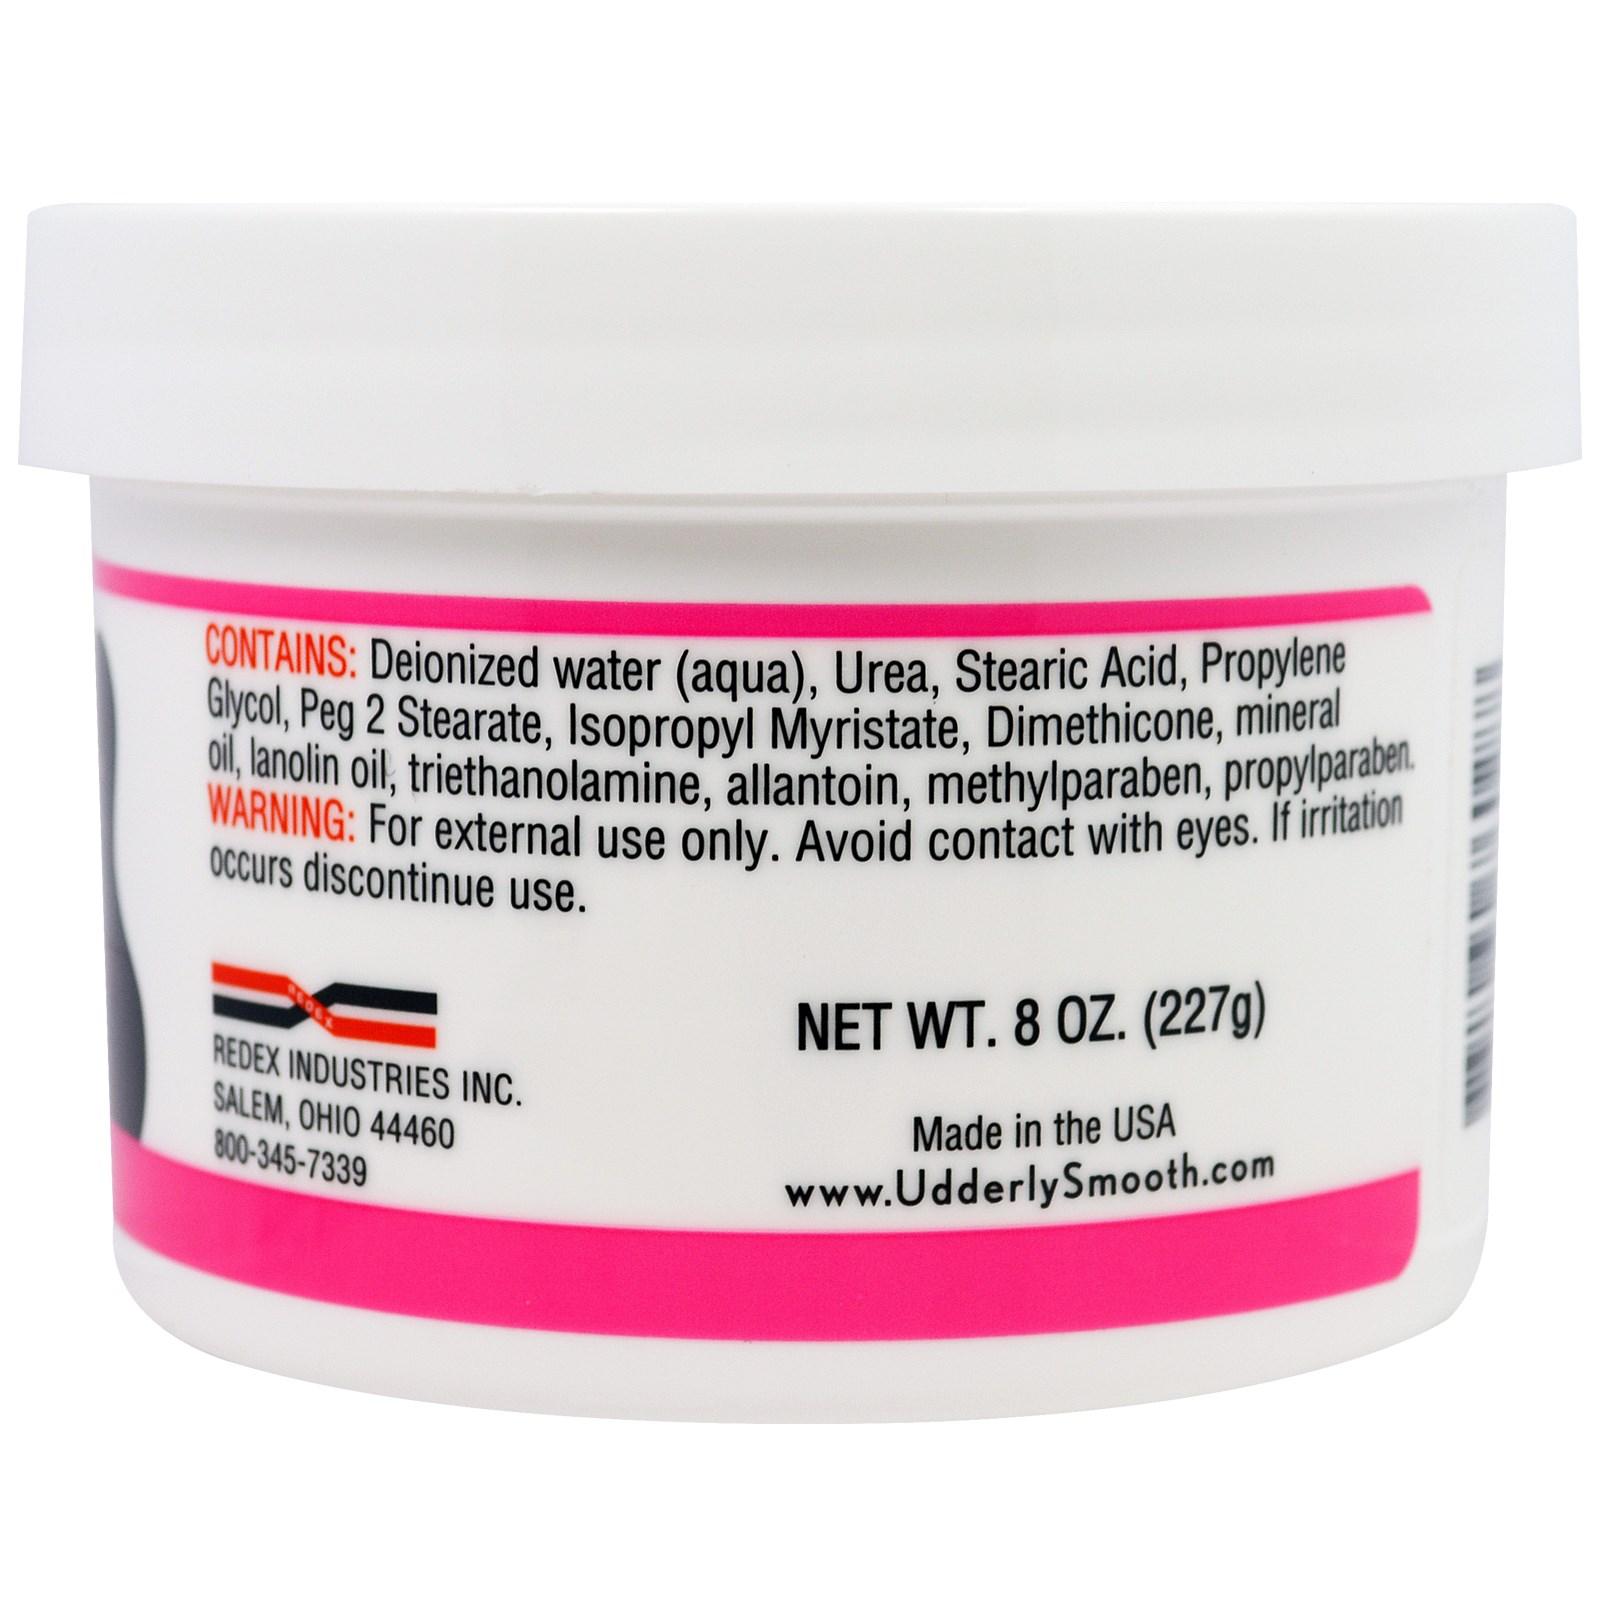 udderly smooth extra care 20 cream